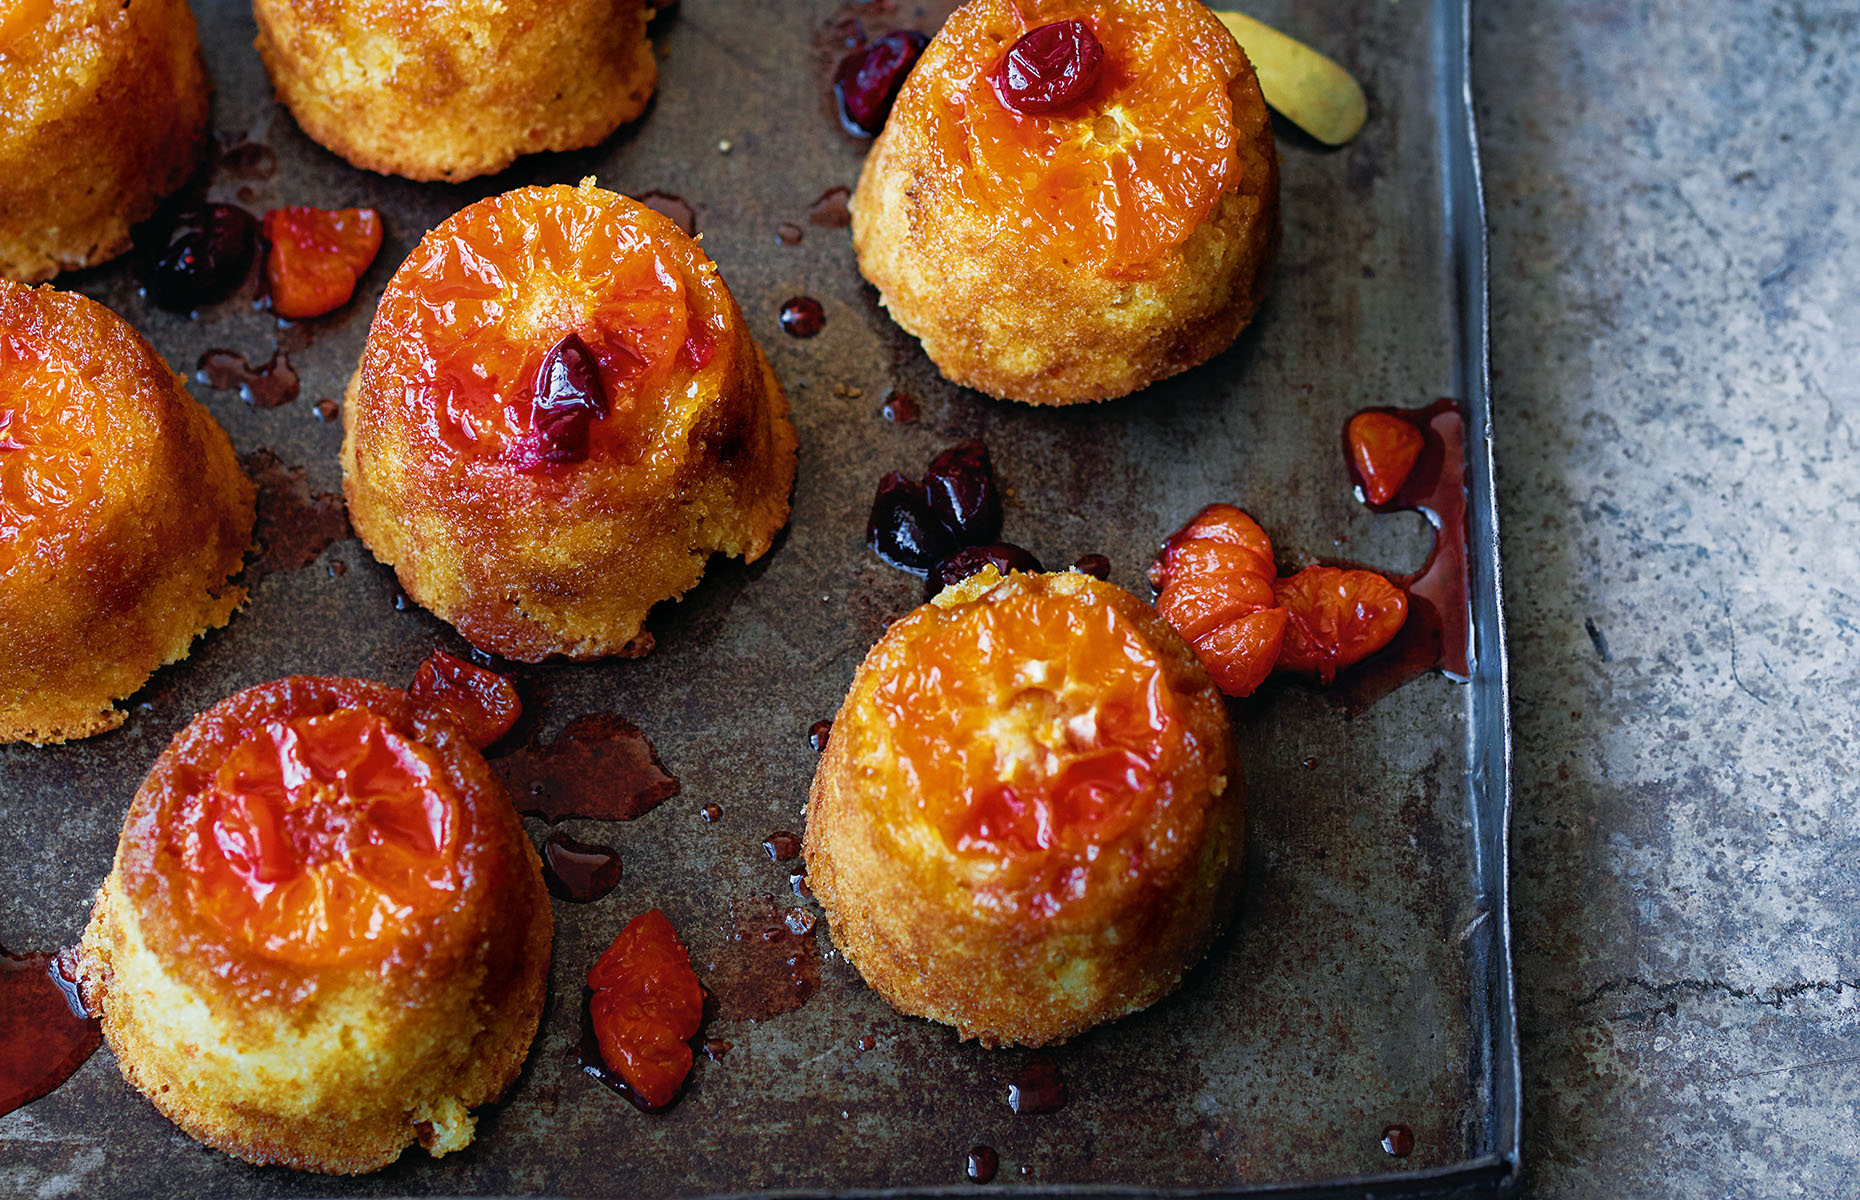 Clementine sponges